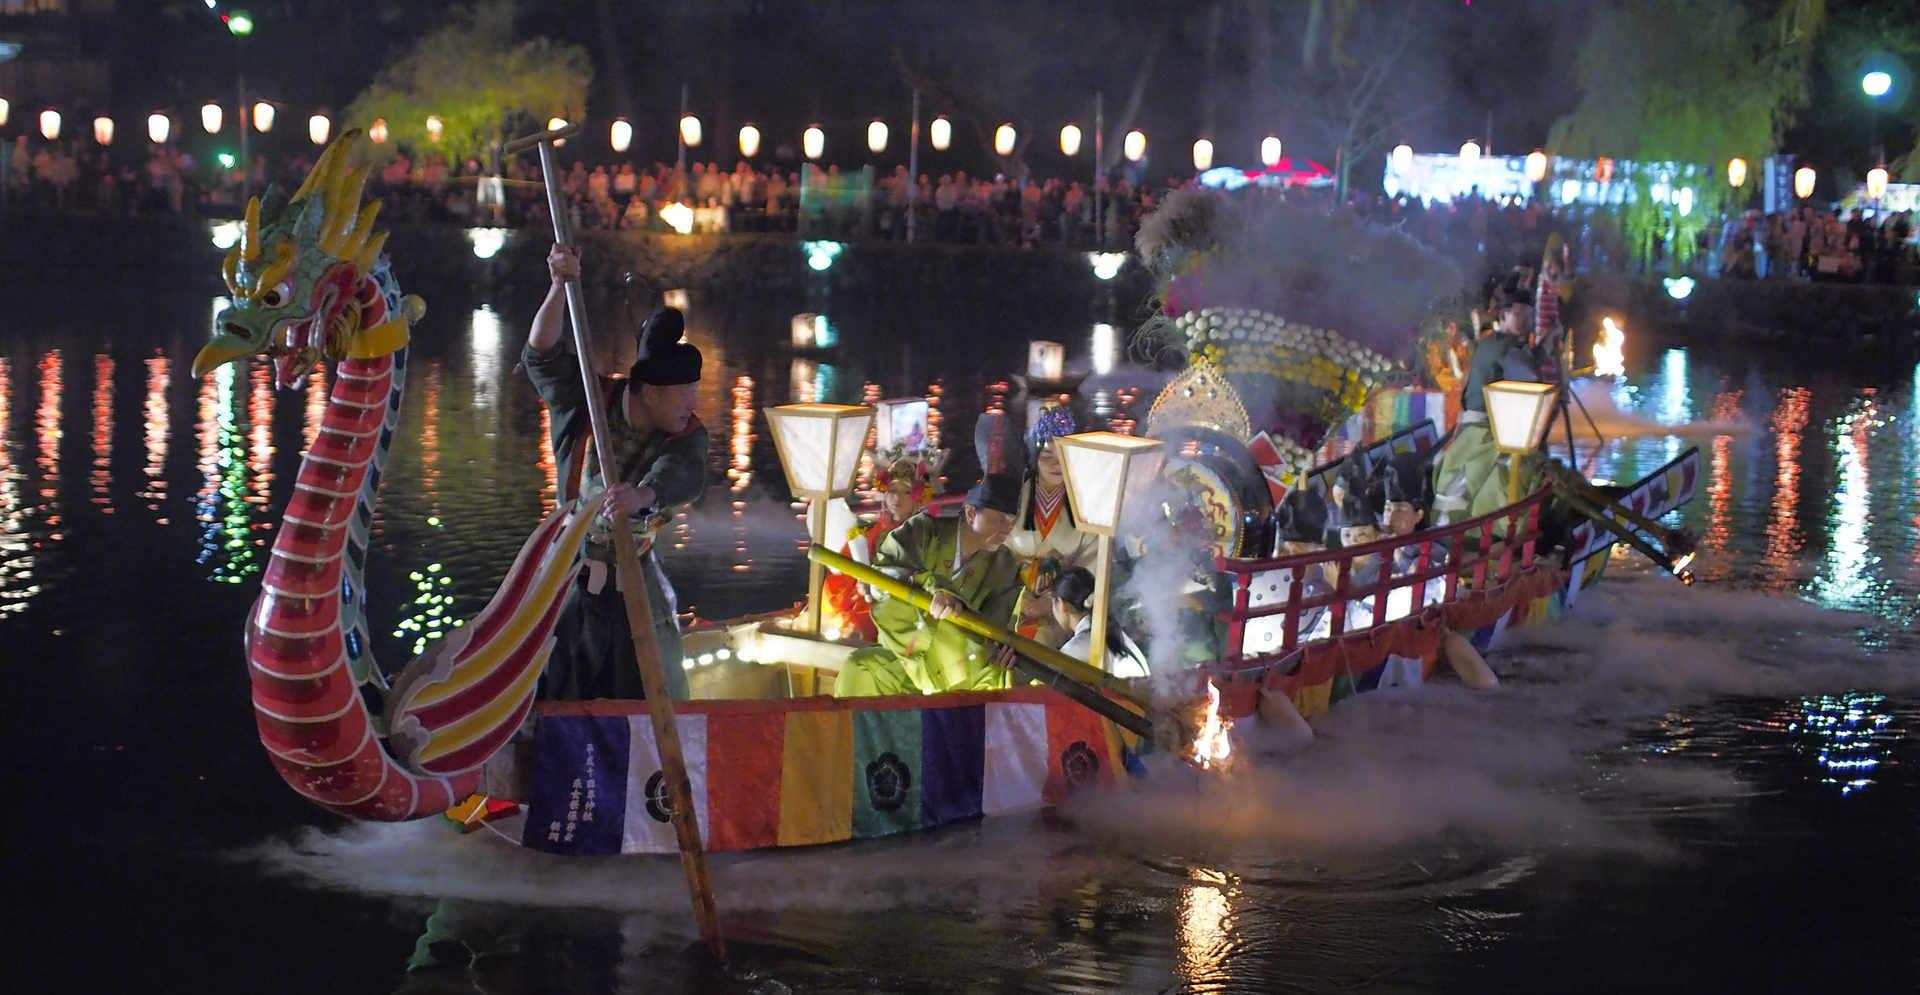 Uneme-sai@Sarusawa-ike pond /采女祭